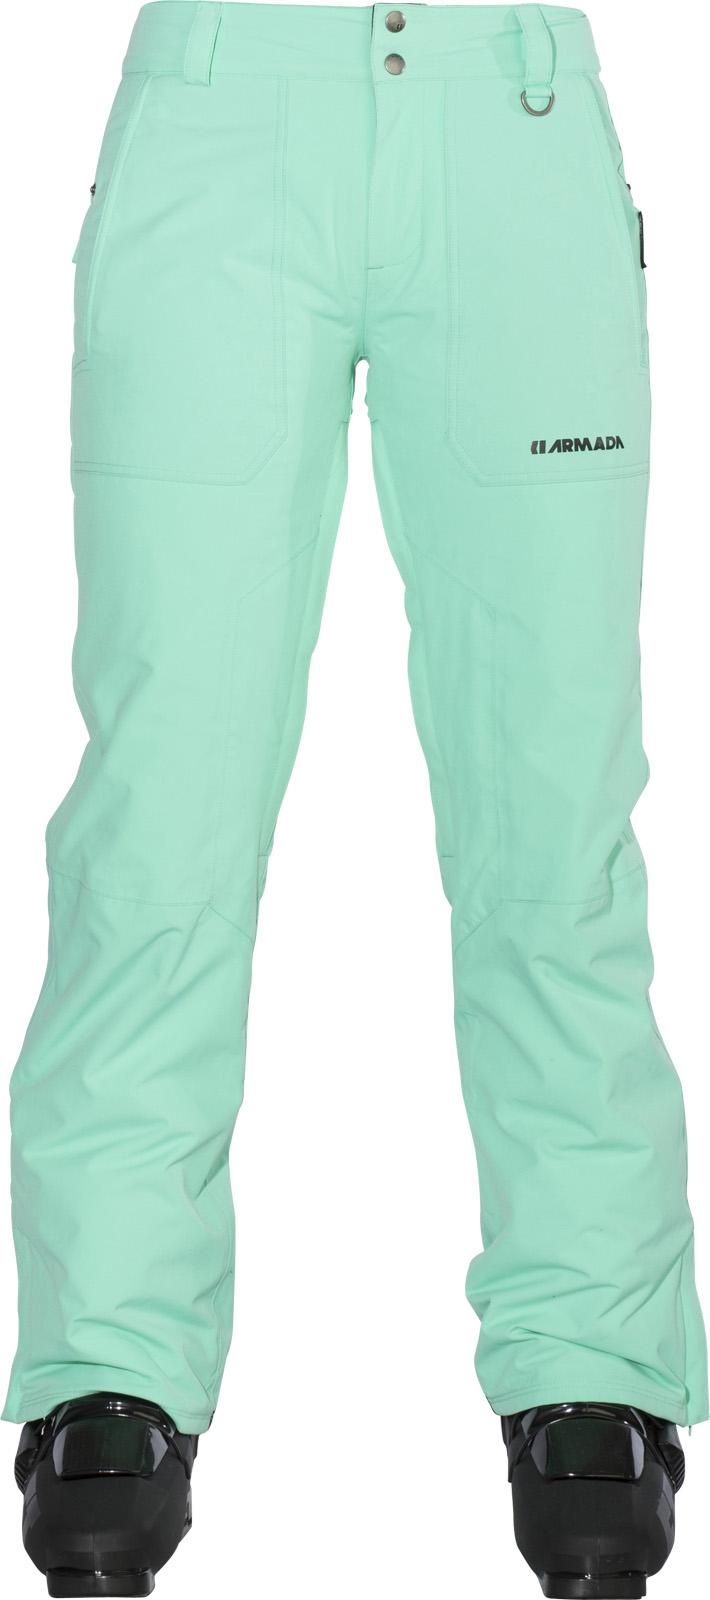 Armada dámské snow kalhoty Lenox Insulated Pant Wintergreen 17/18 Velikost: S + doprava zdarma, sleva při registraci Doprava zdarma